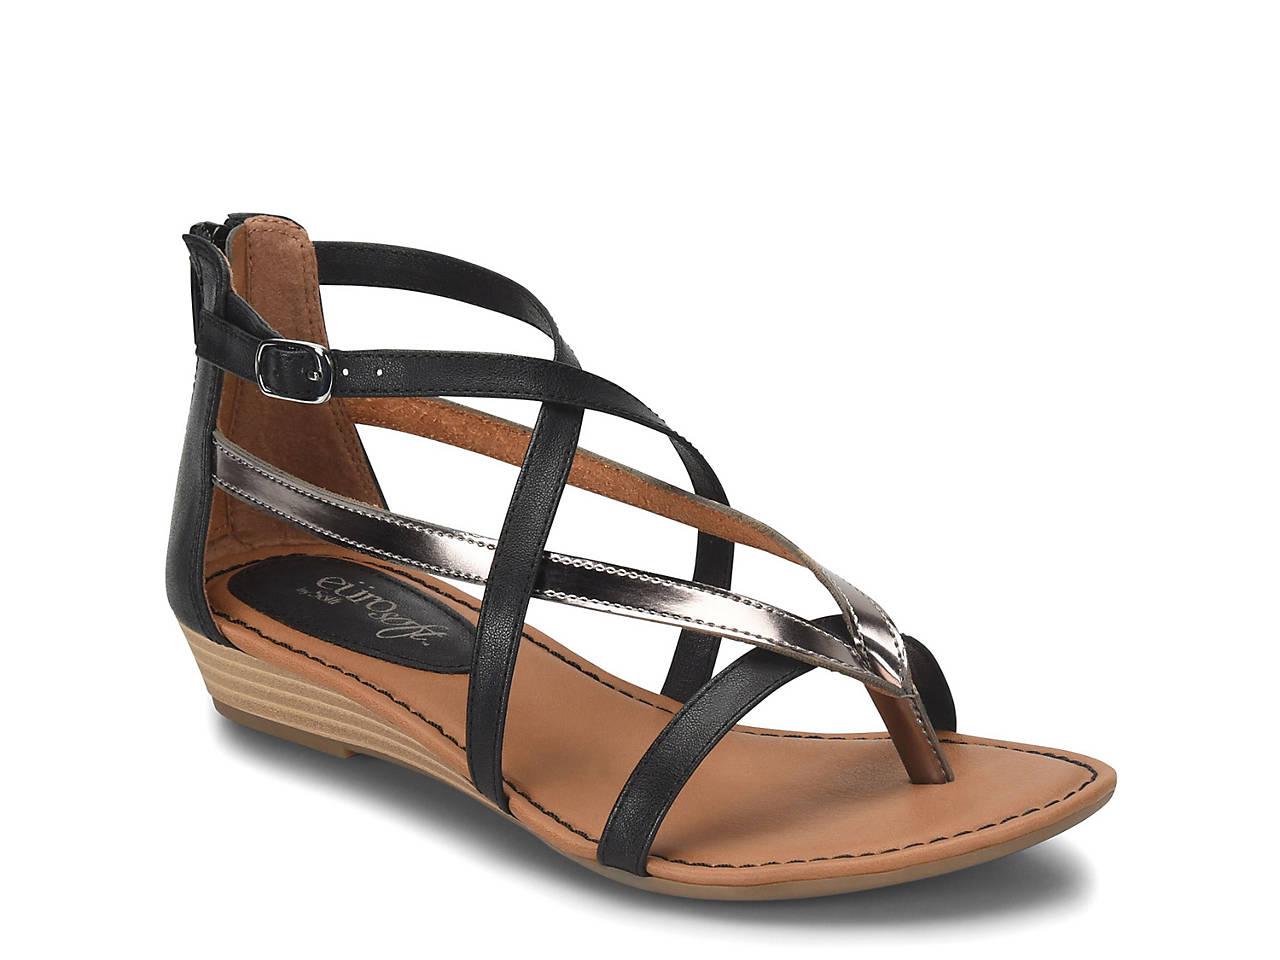 3f893403b7a5 Eurosoft Melba Wedge Sandal Women s Shoes